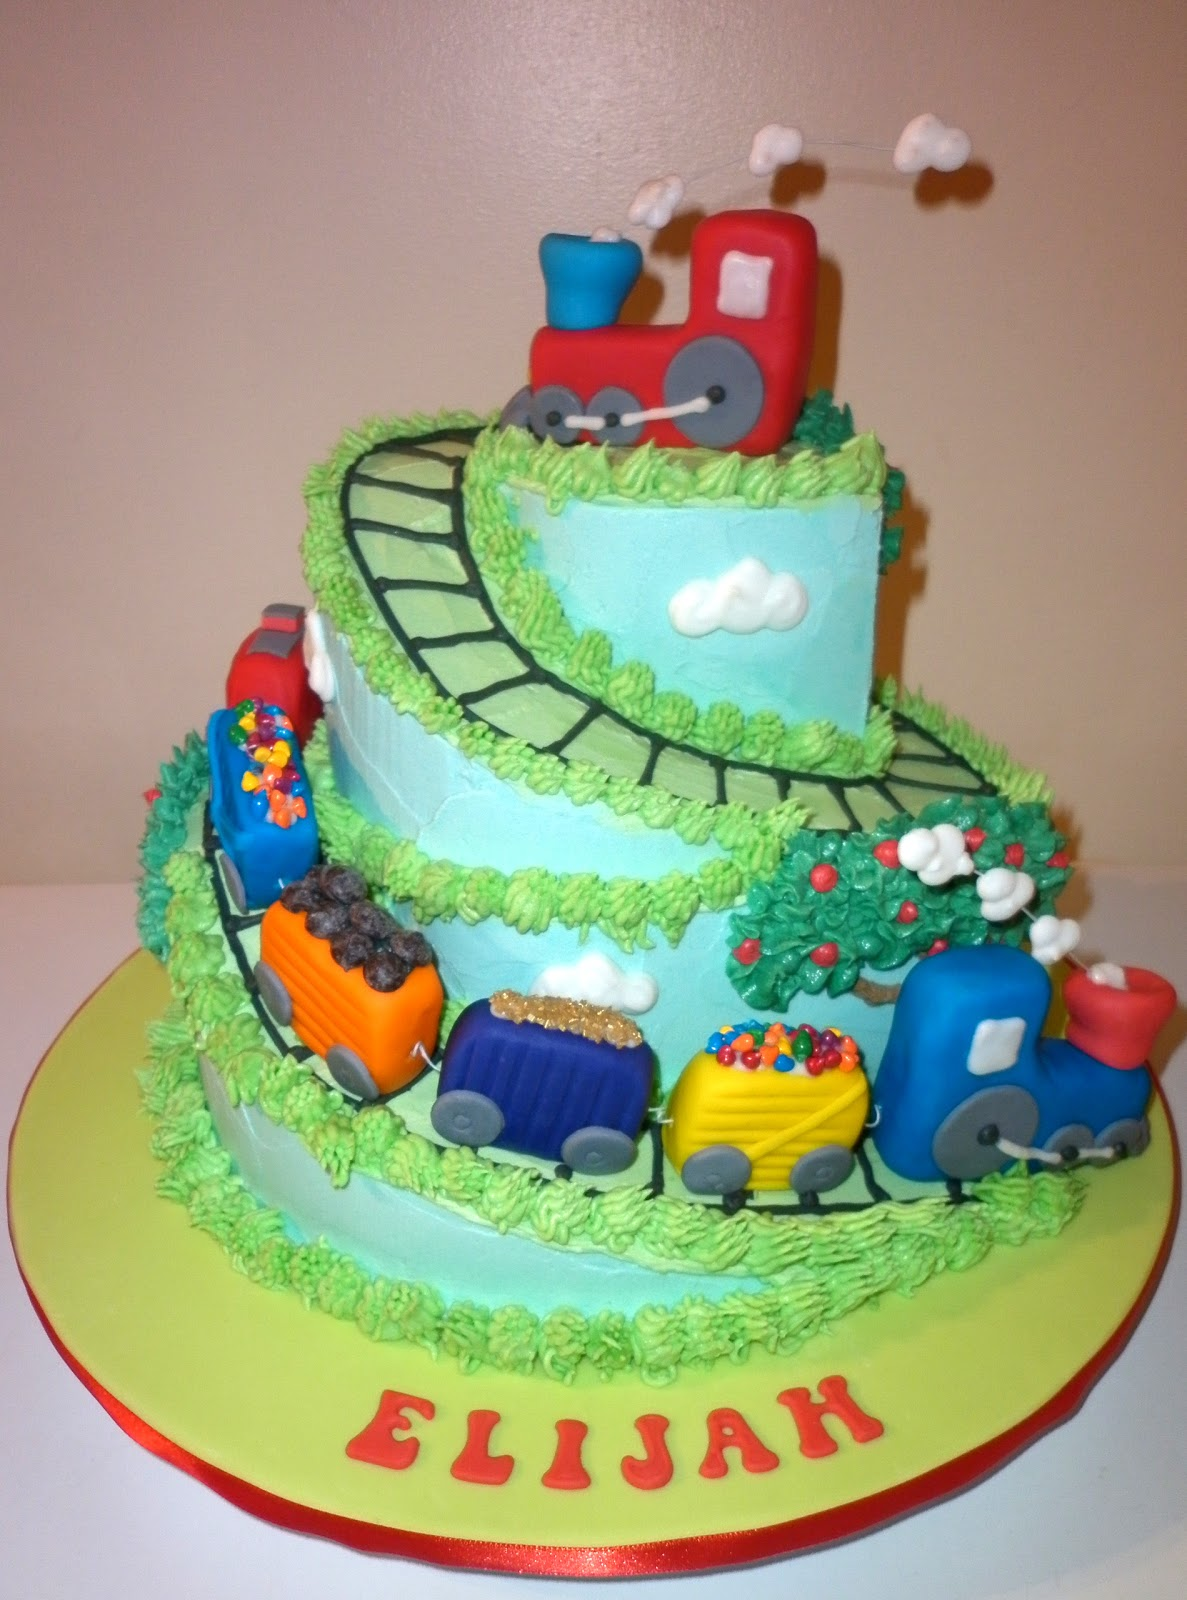 Caketopia Train Cake For Elijah